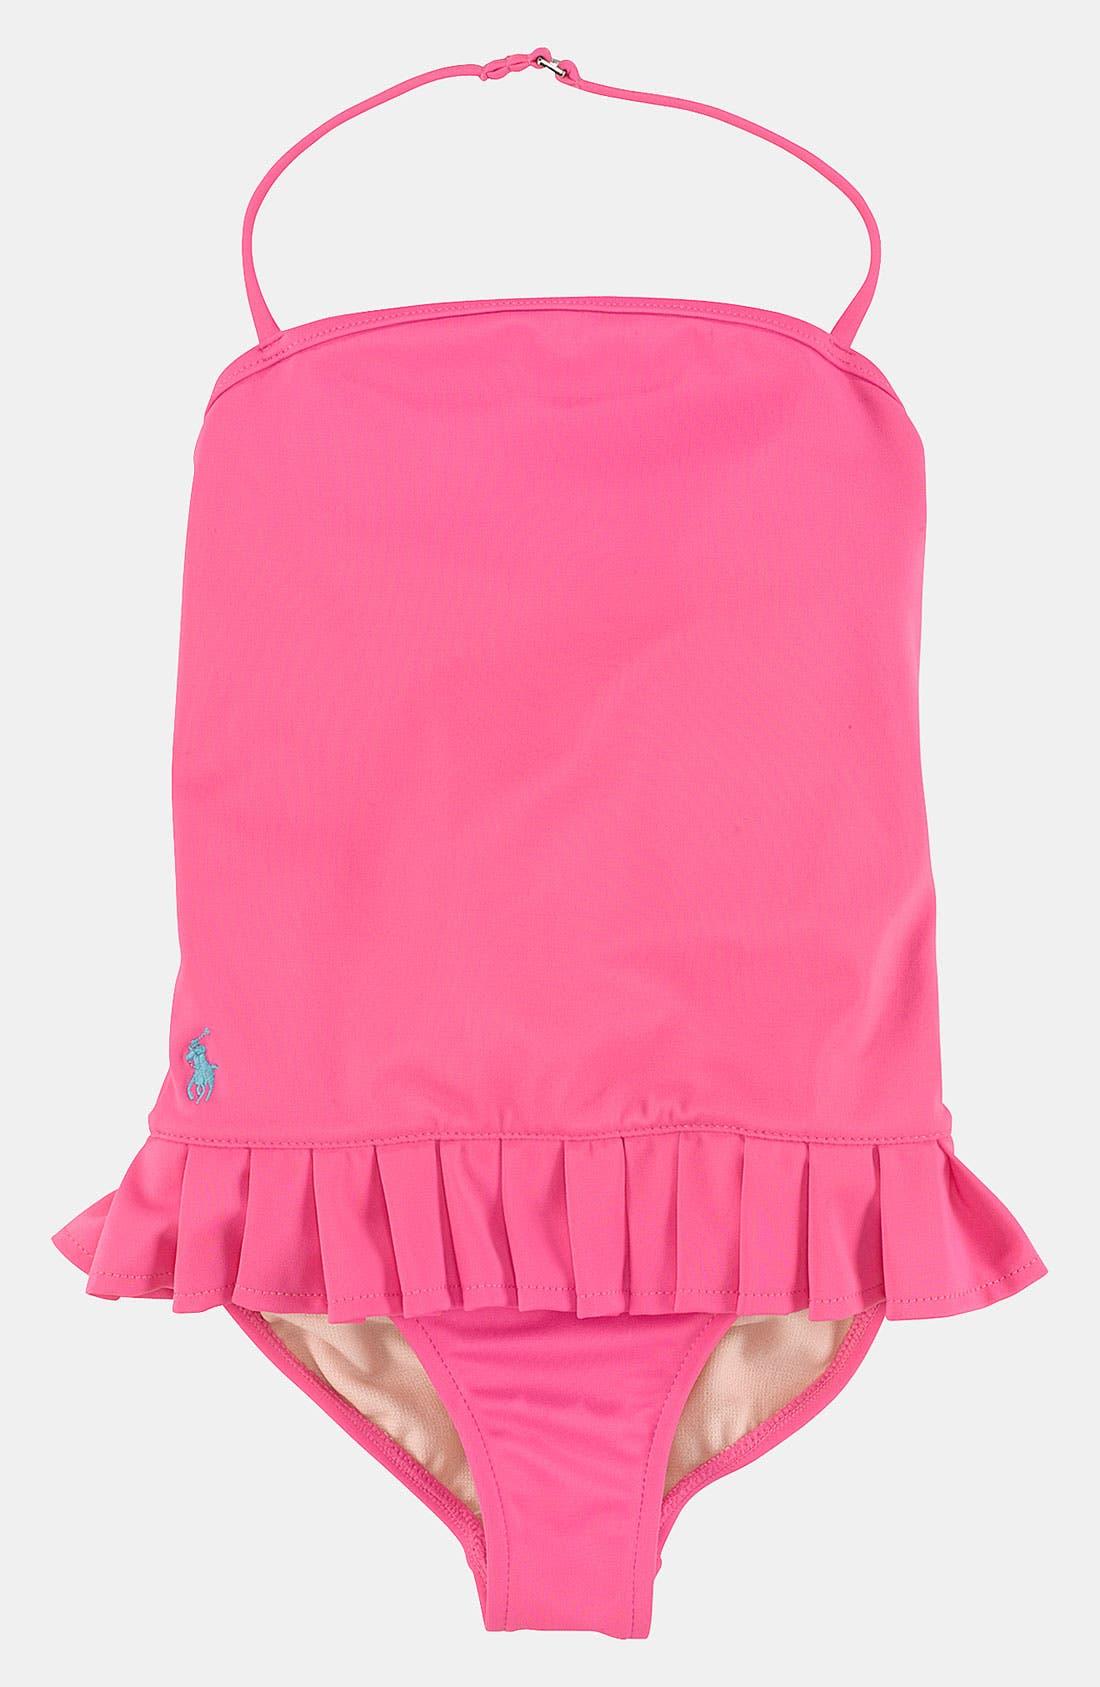 Main Image - Ralph Lauren One Piece Swimsuit (Toddler)